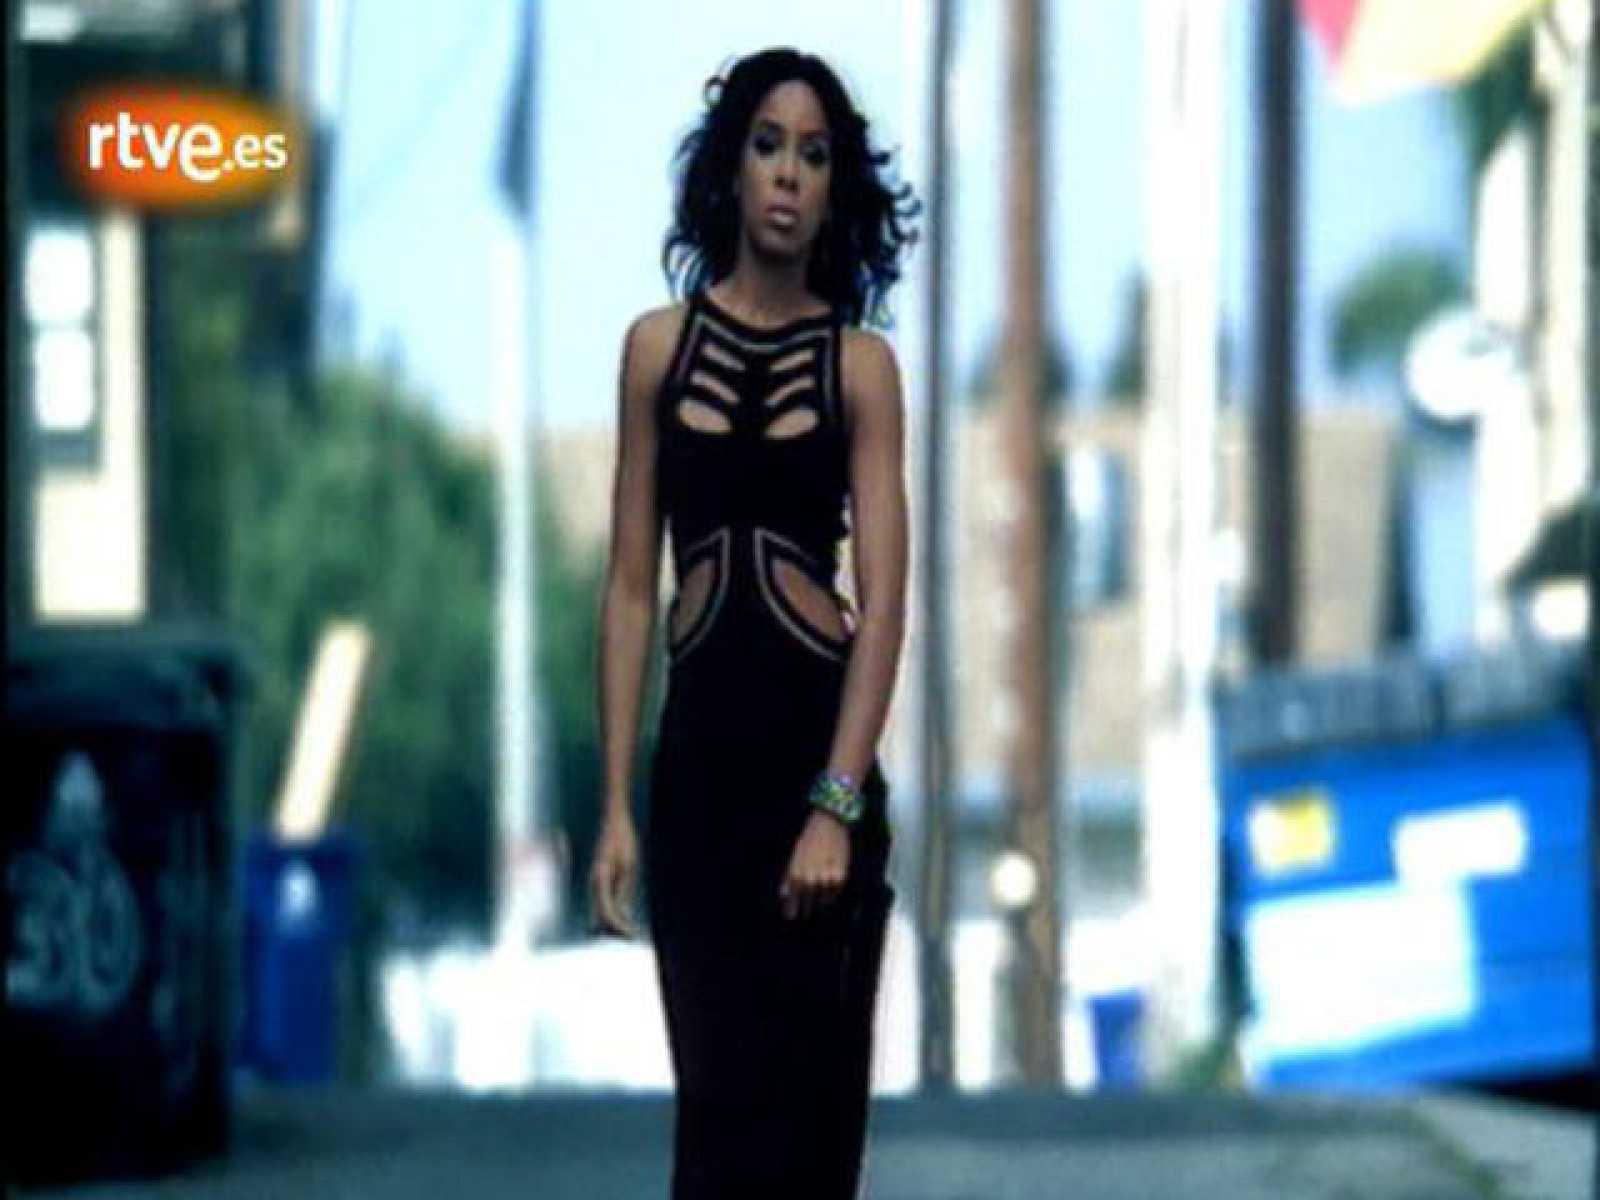 David Guetta & Kelly Rowland: 'When Love Takes Over' (Videoclip)